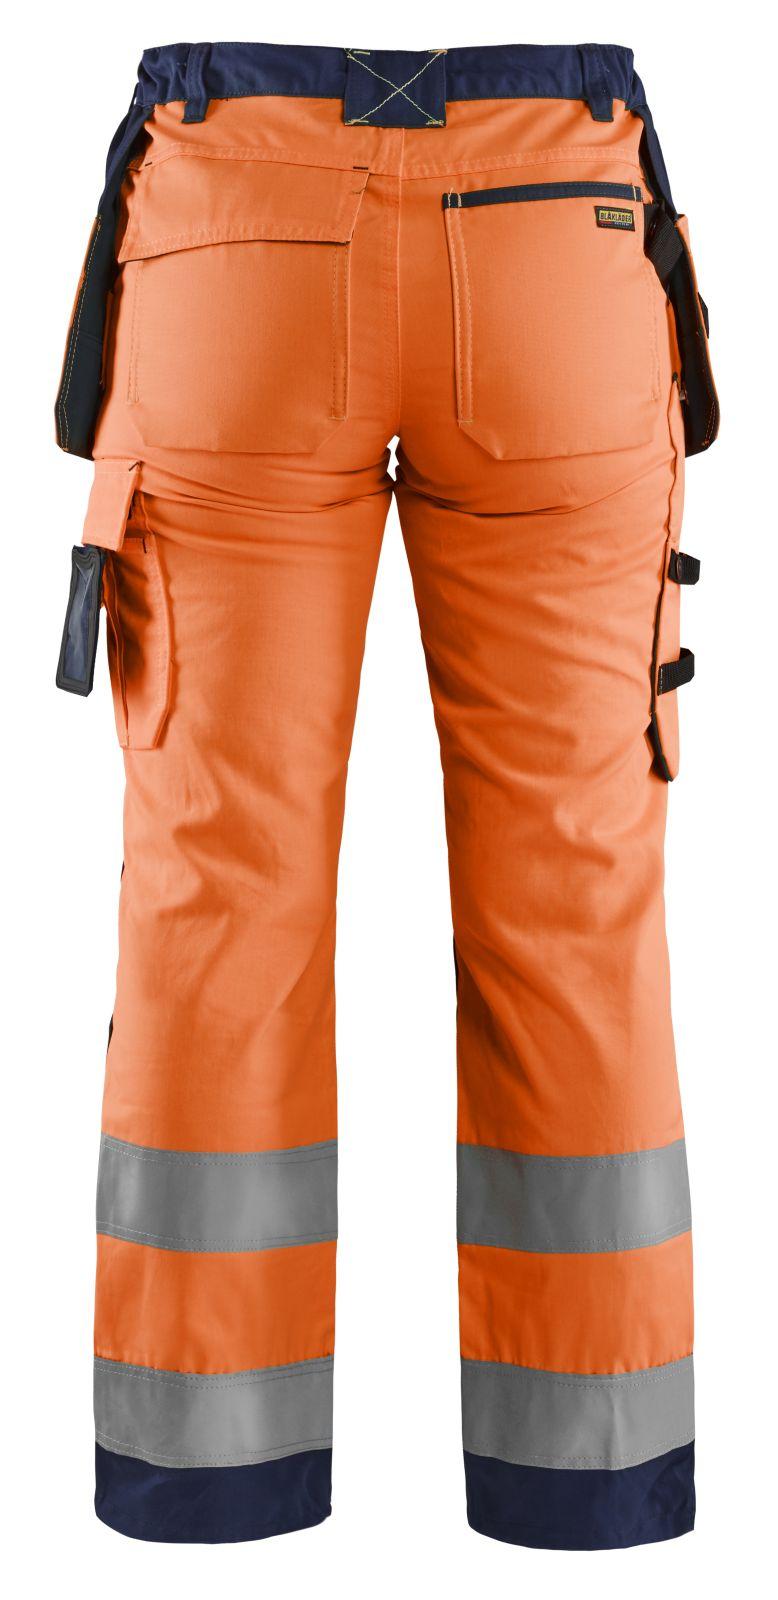 Blaklader Dames werkbroeken 71561811 High Vis oranje-marineblauw(5389)